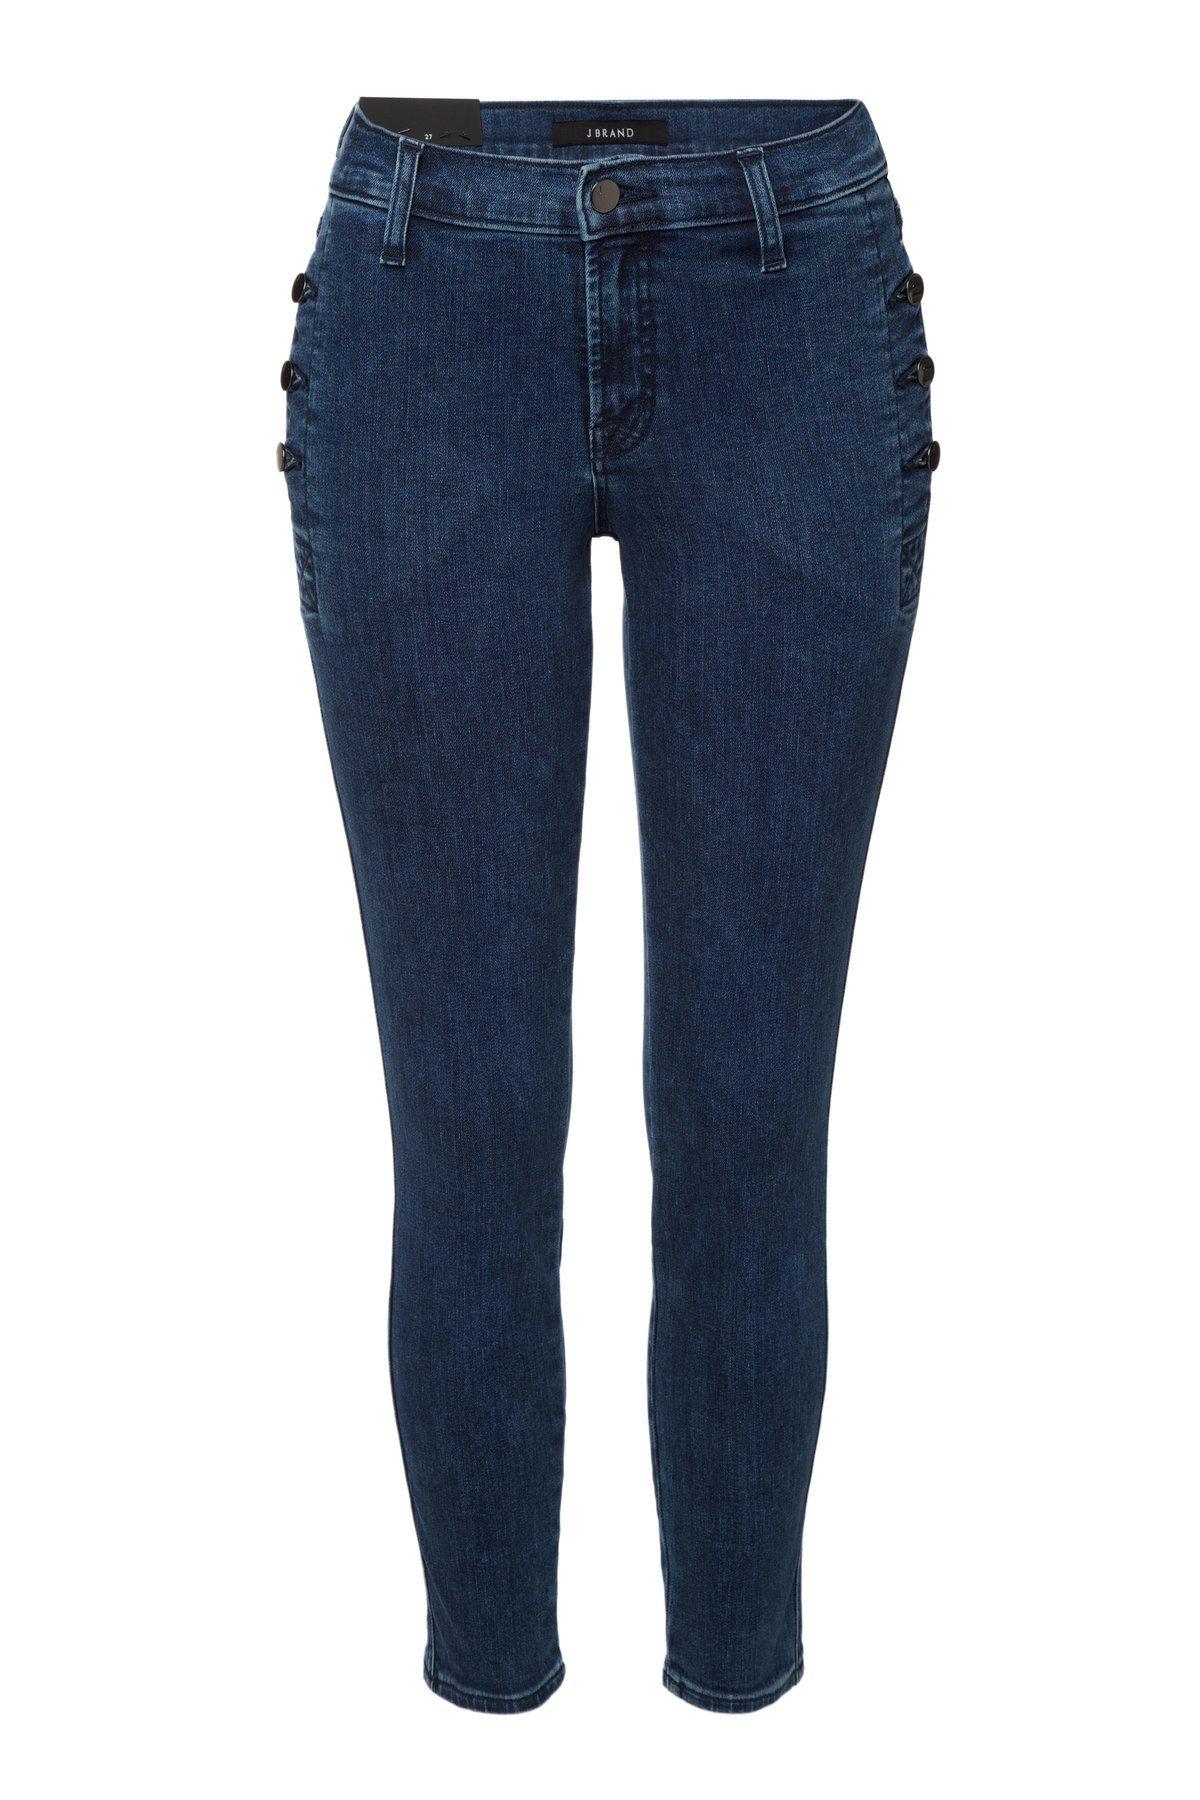 J brand green velvet dress  J Brand  Mid Rise Skinny Jeans with Buttoned Pockets on STYLEBOP